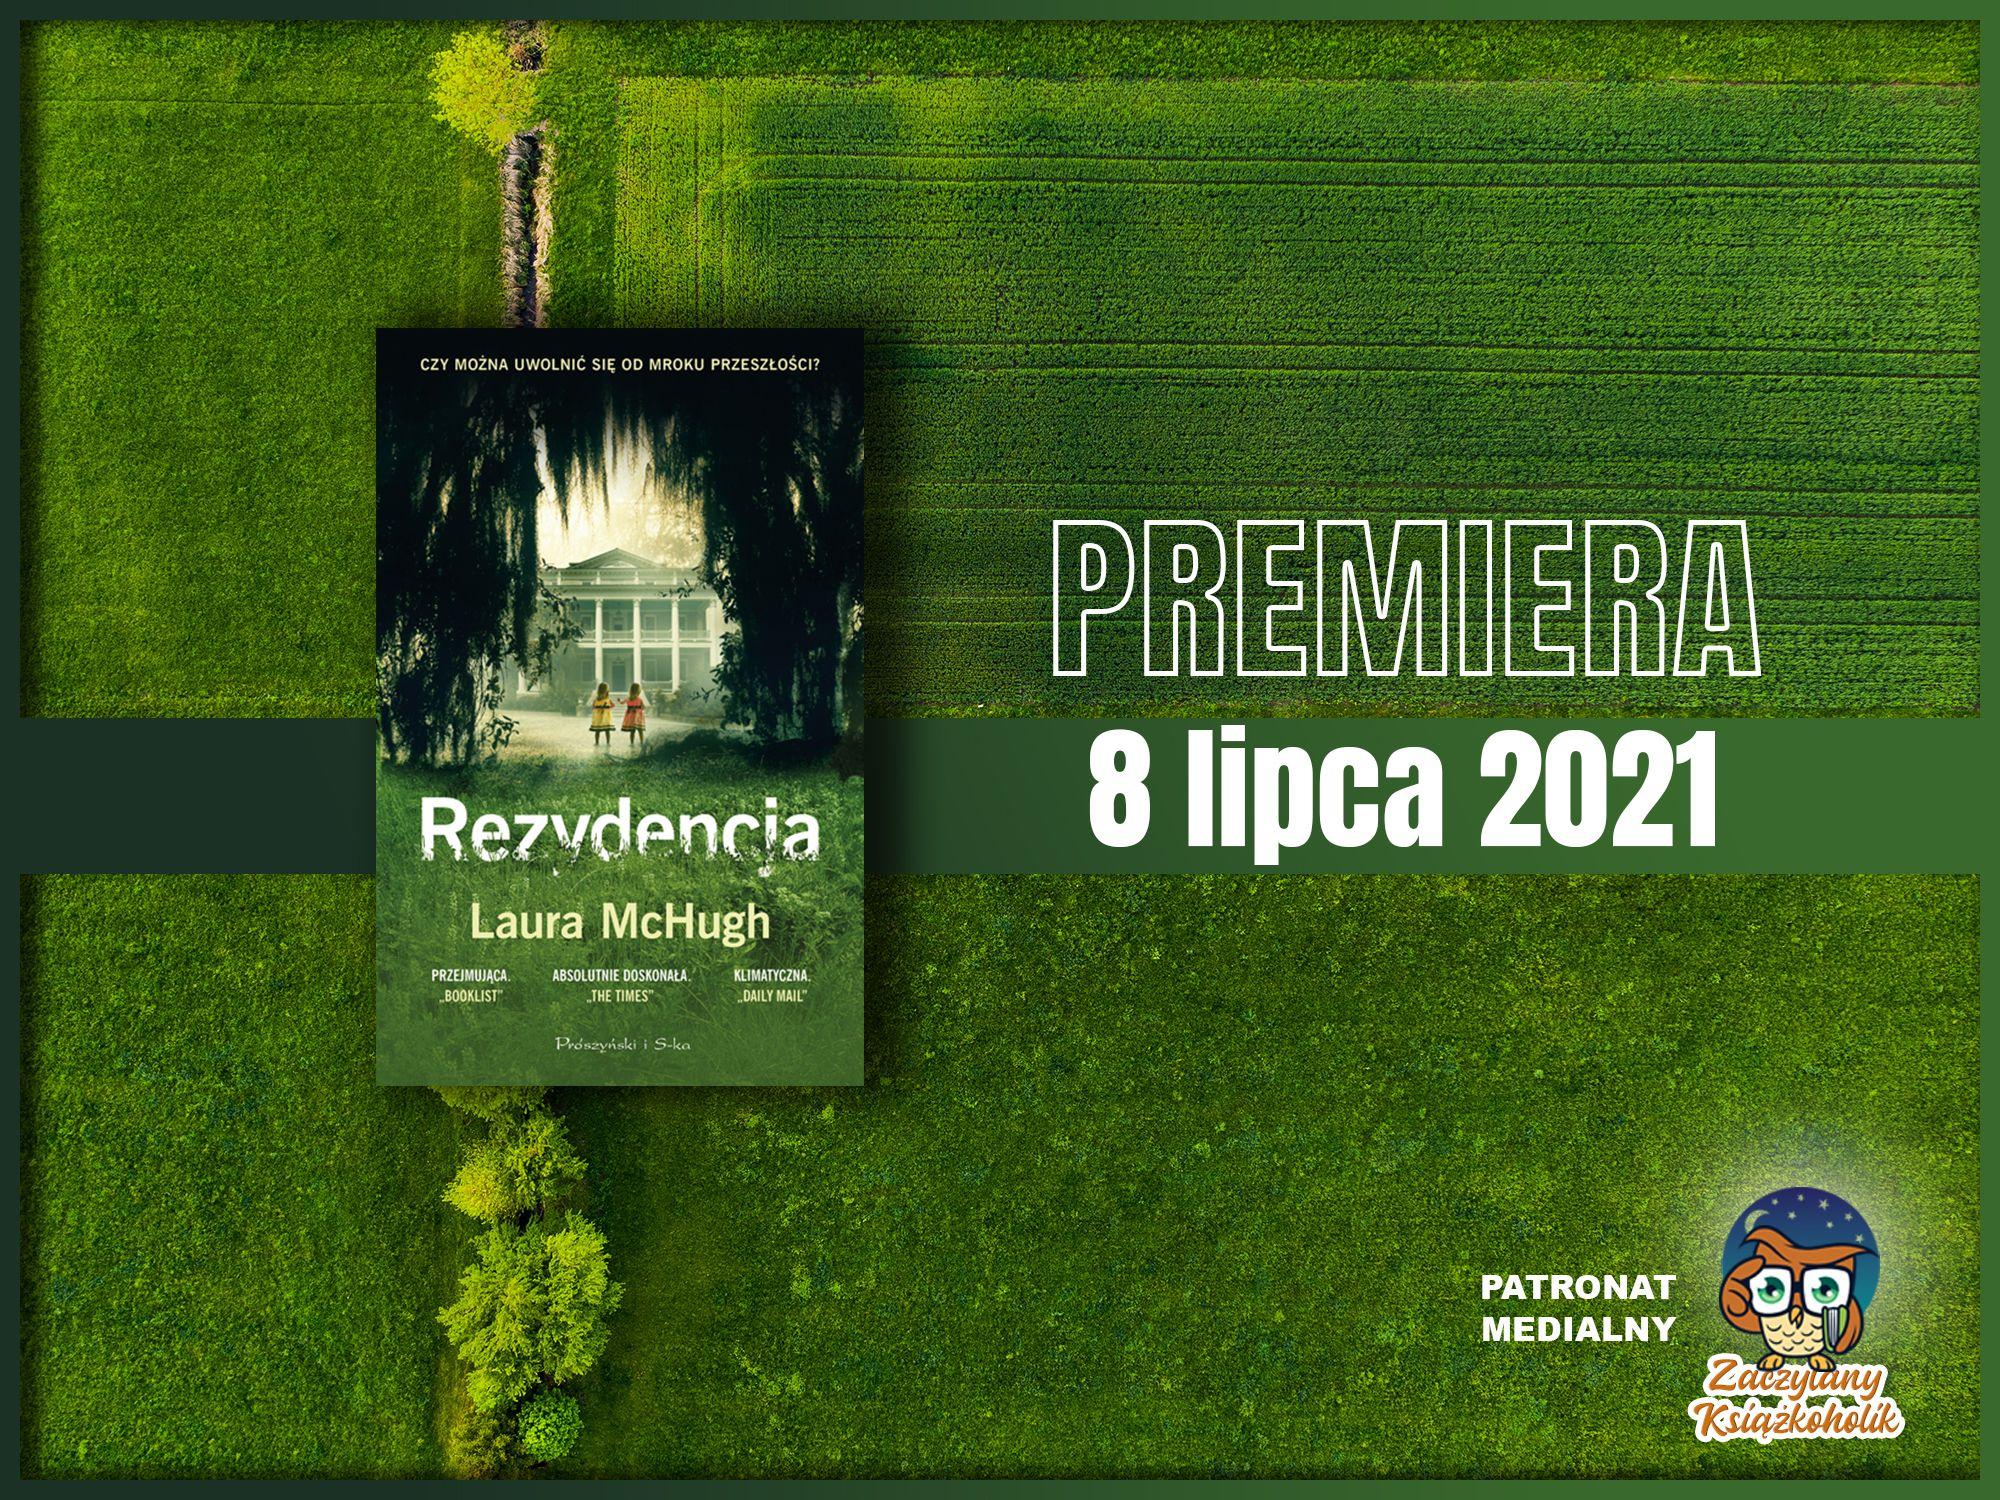 Rezydencja, Laura McHugh, zaczytanyksiazkoholik.pl